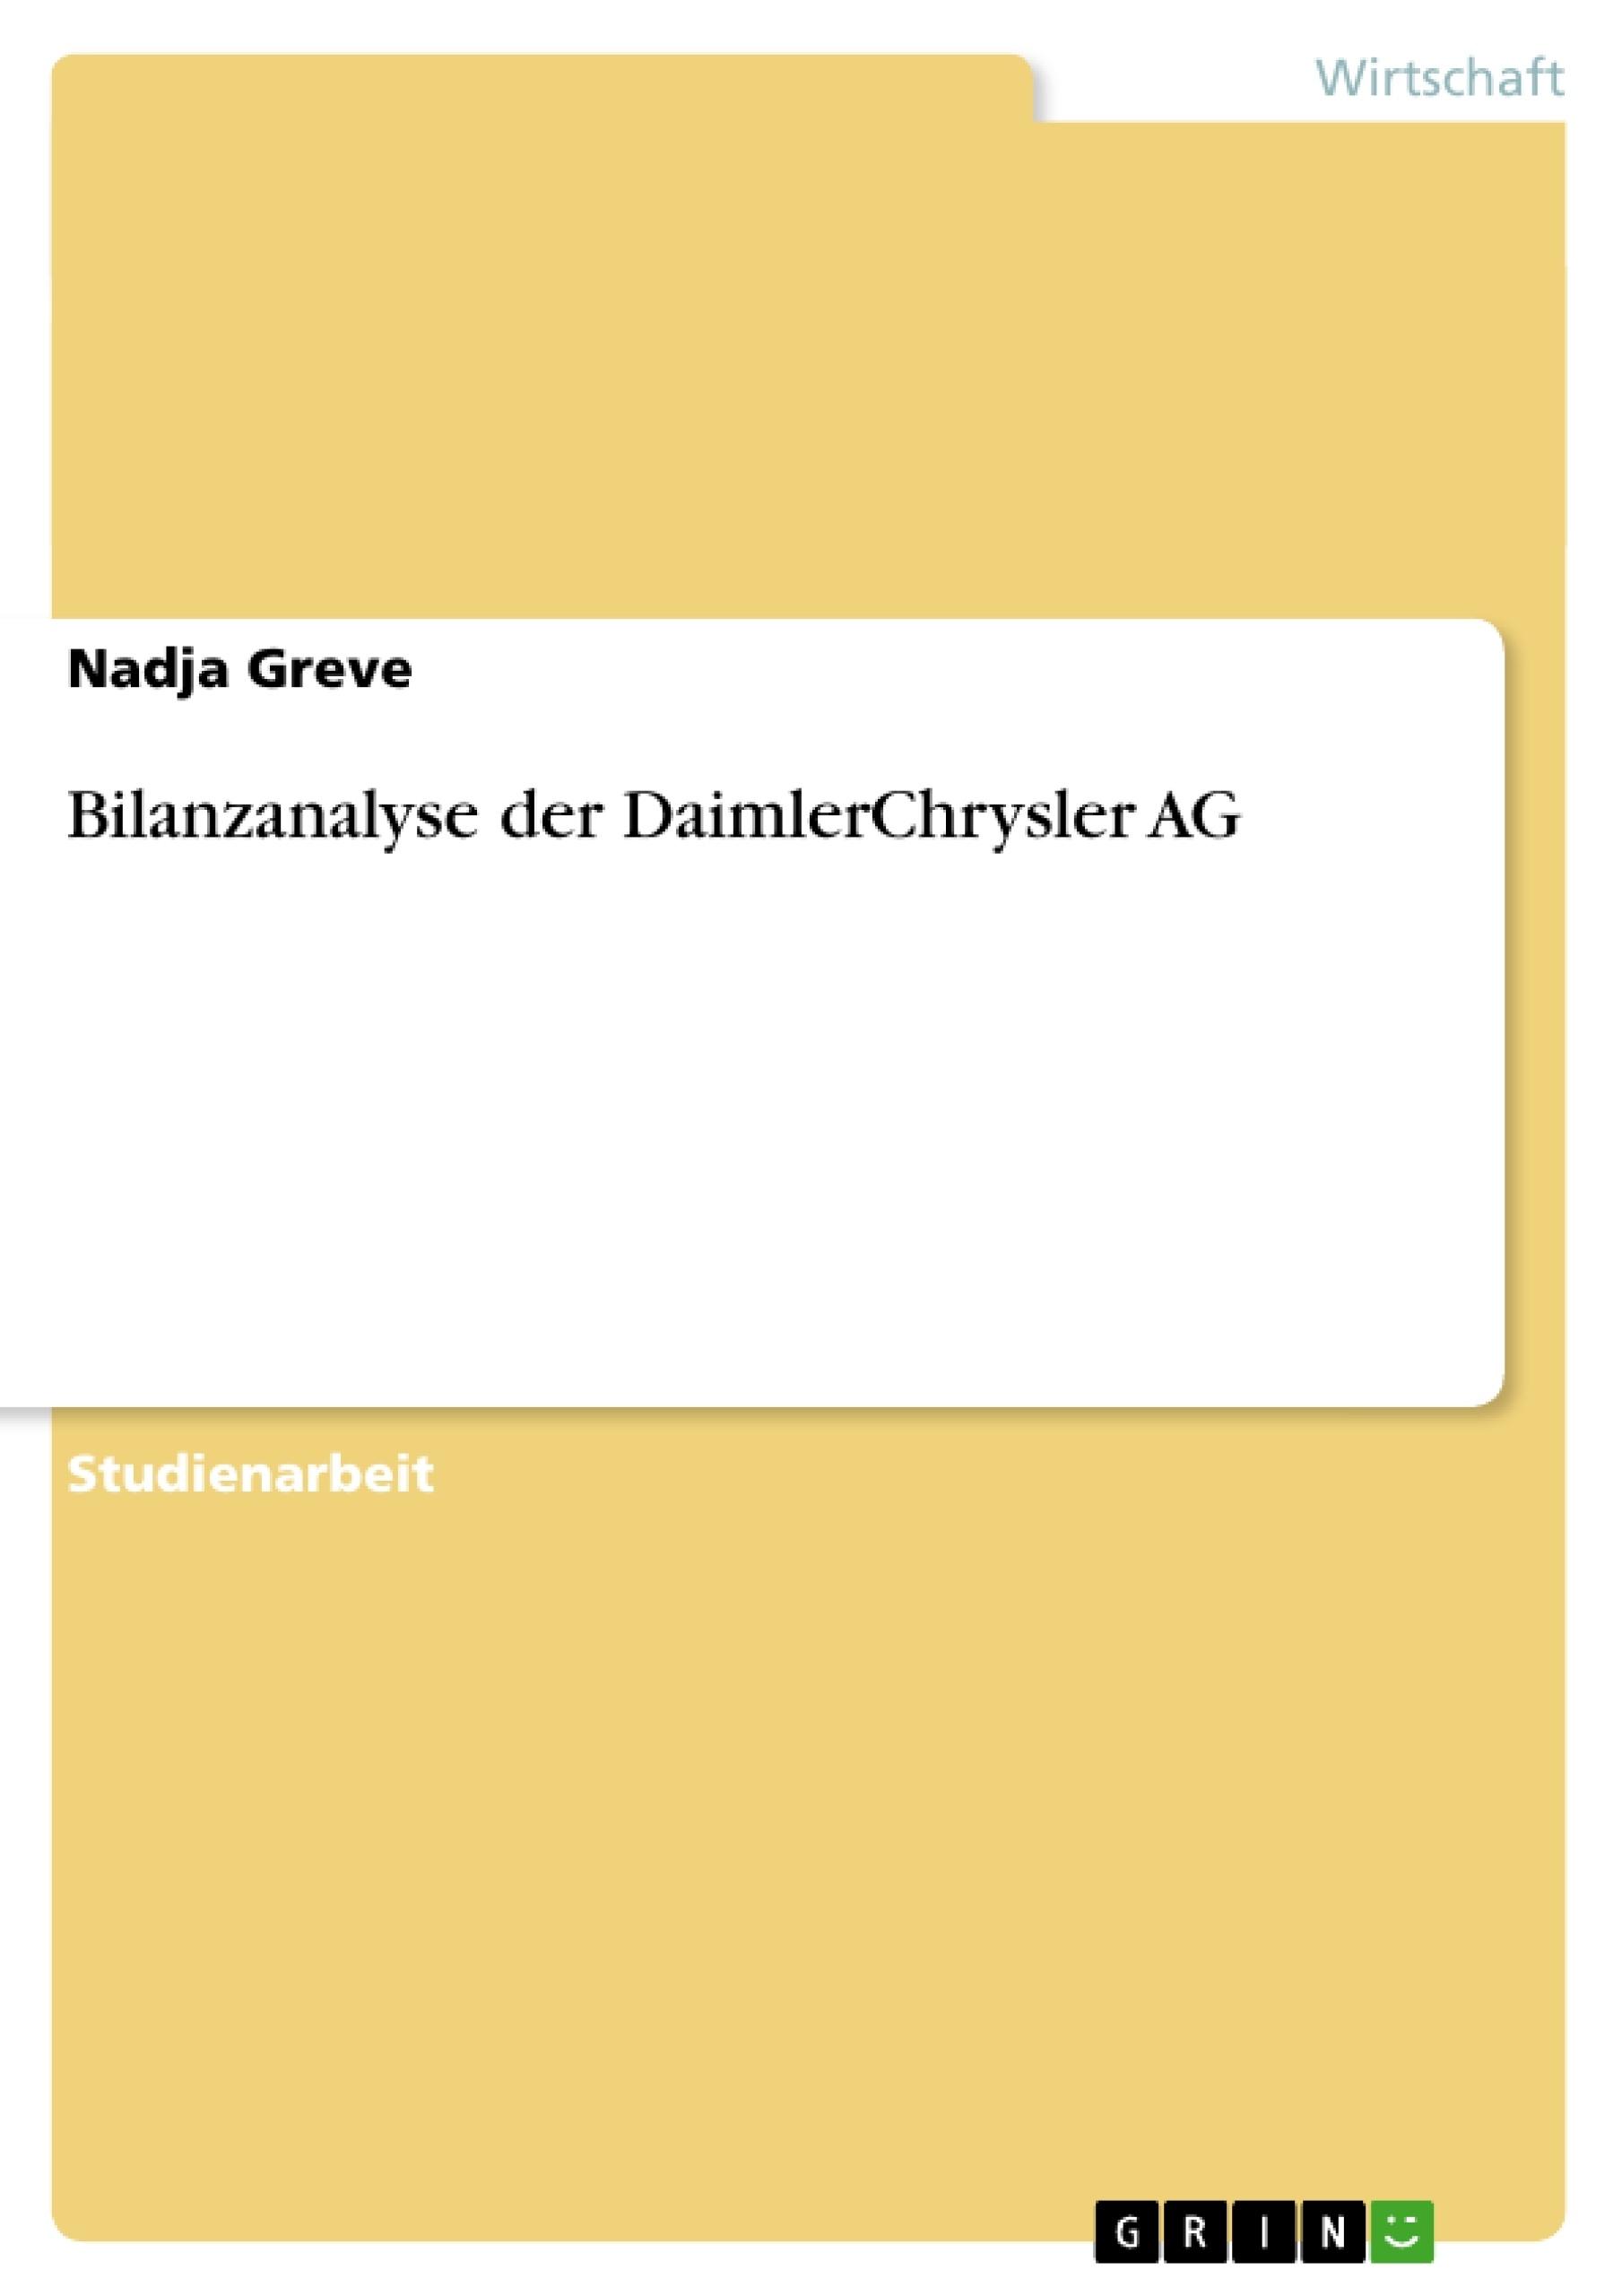 Titel: Bilanzanalyse der DaimlerChrysler AG